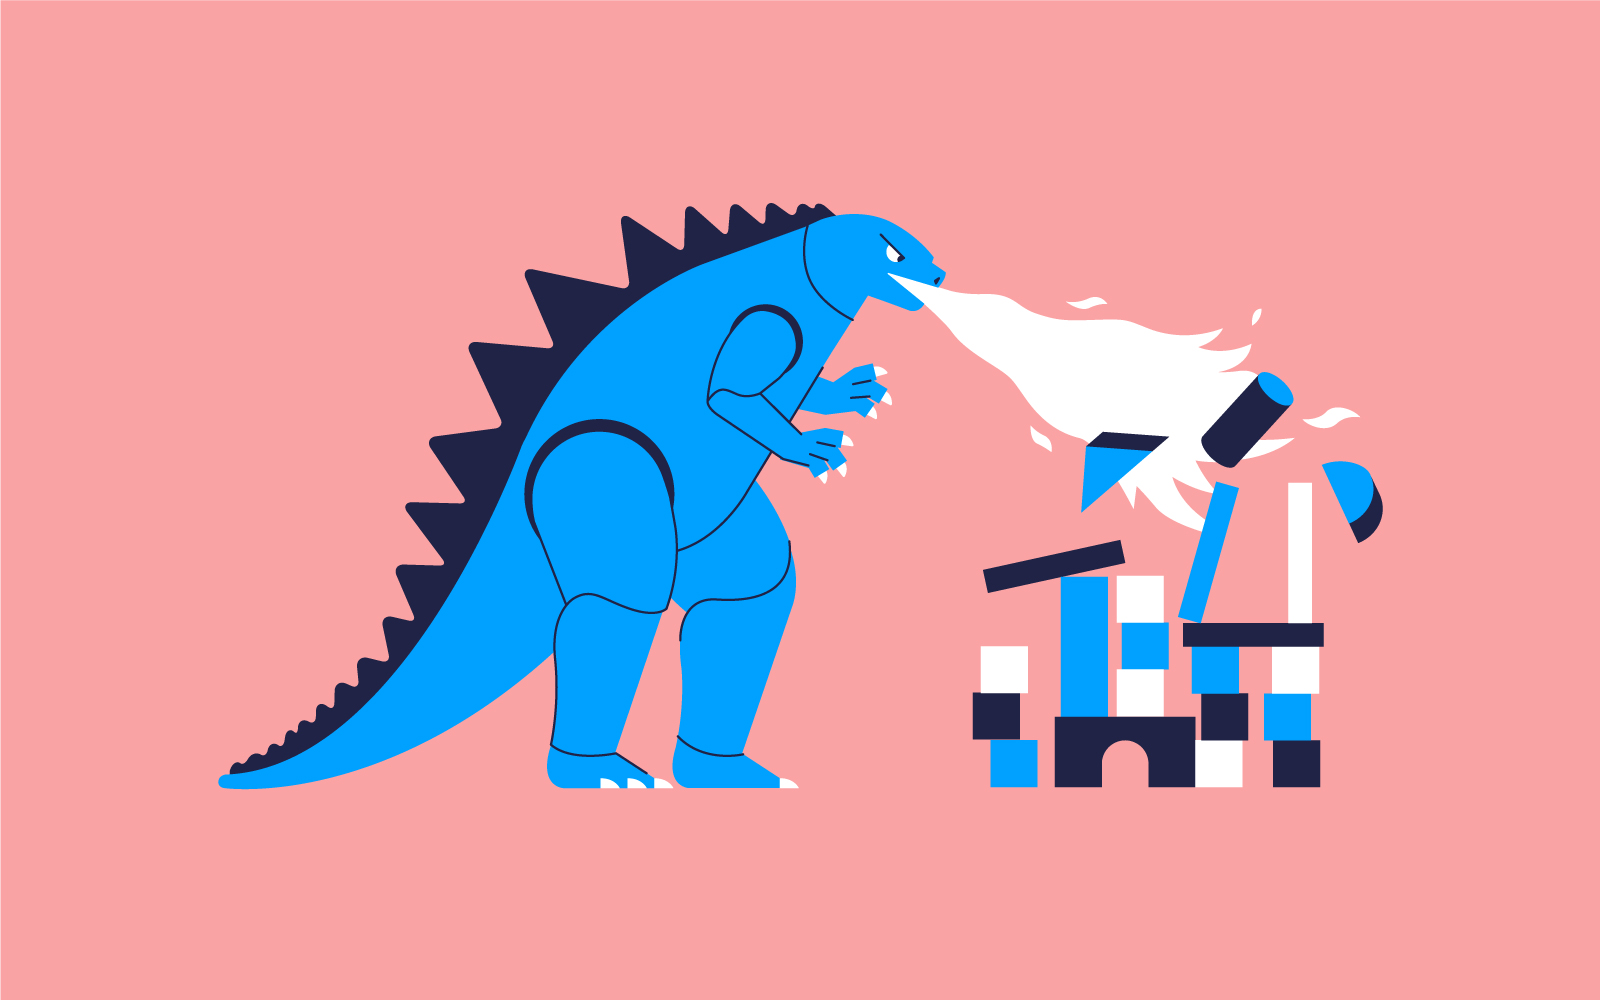 Plastikgodzilla gegen Holzklotztürme – wer gewinnt? Illustration: Benjamin Hermann